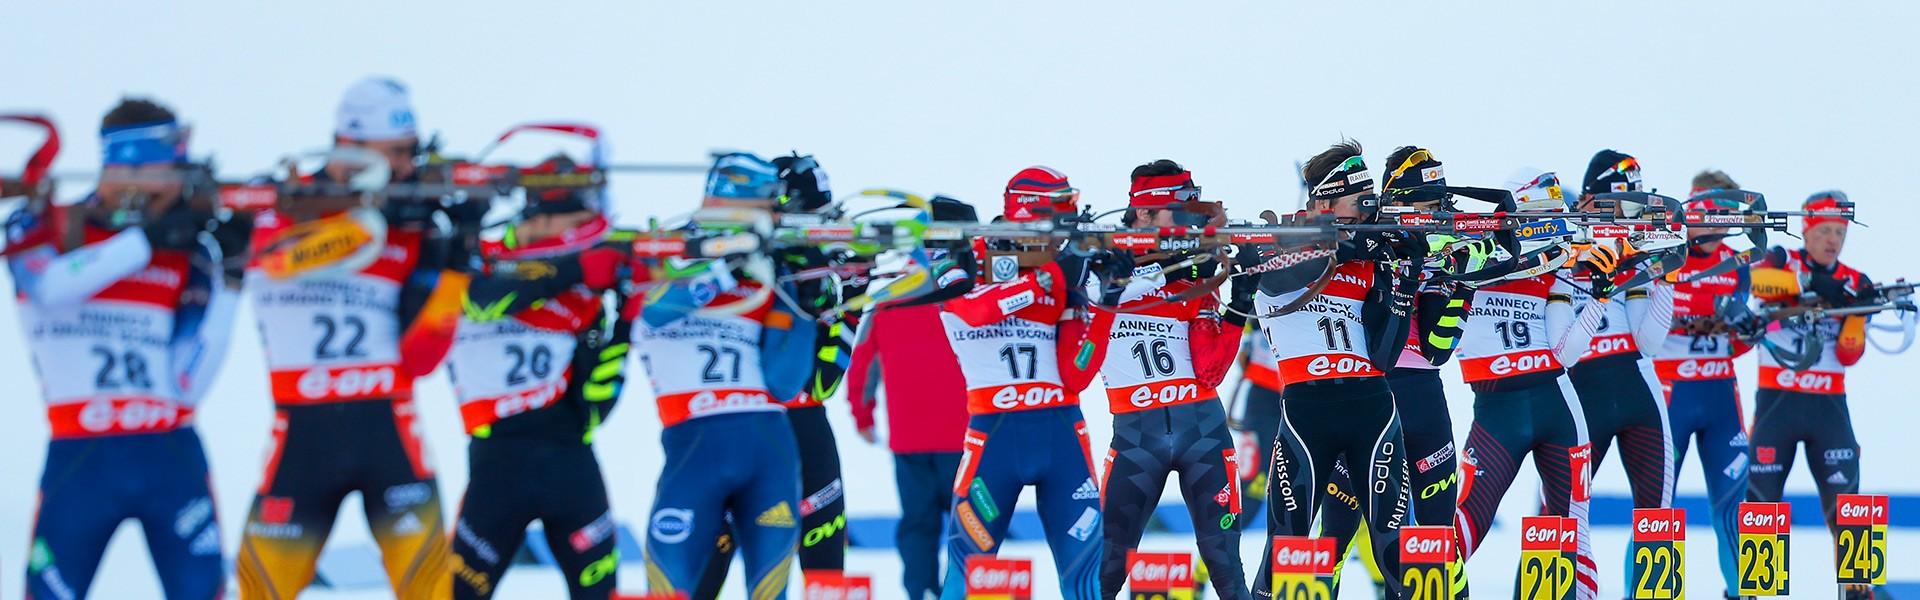 biathlon-zoom-agence-s-gruden-2873